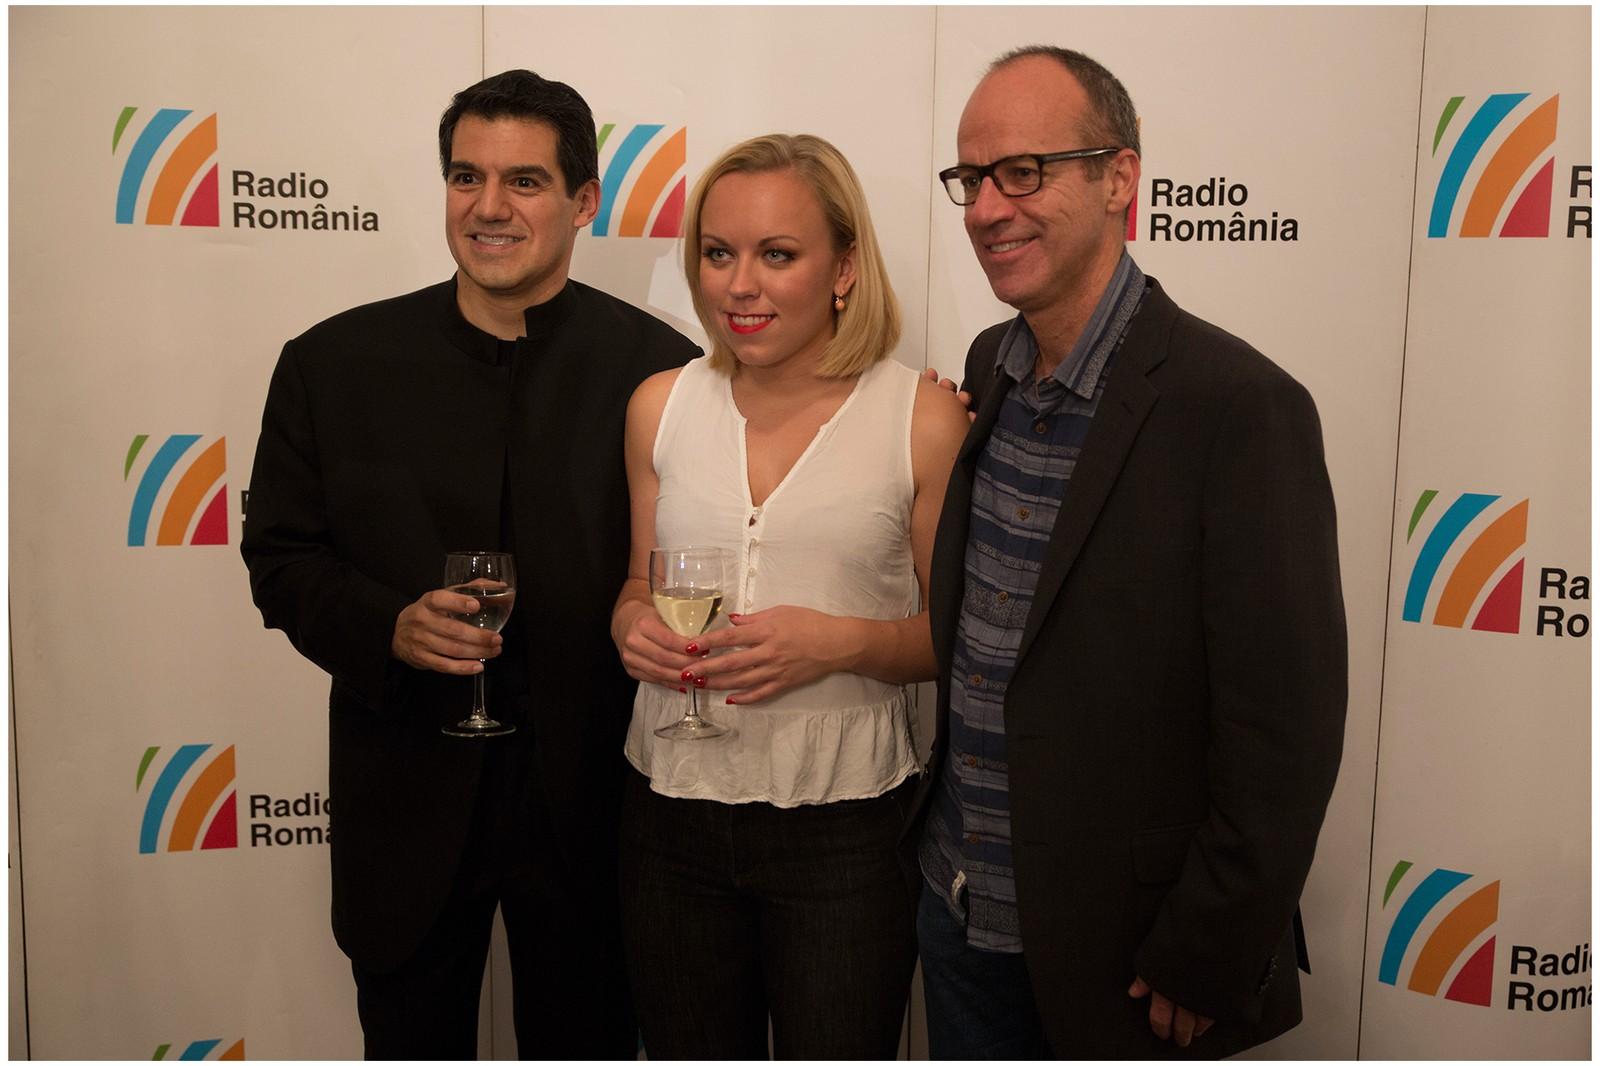 Miguel Harth-Bedoya, Tine Thing Helseth og konsertmester Harald Aadland